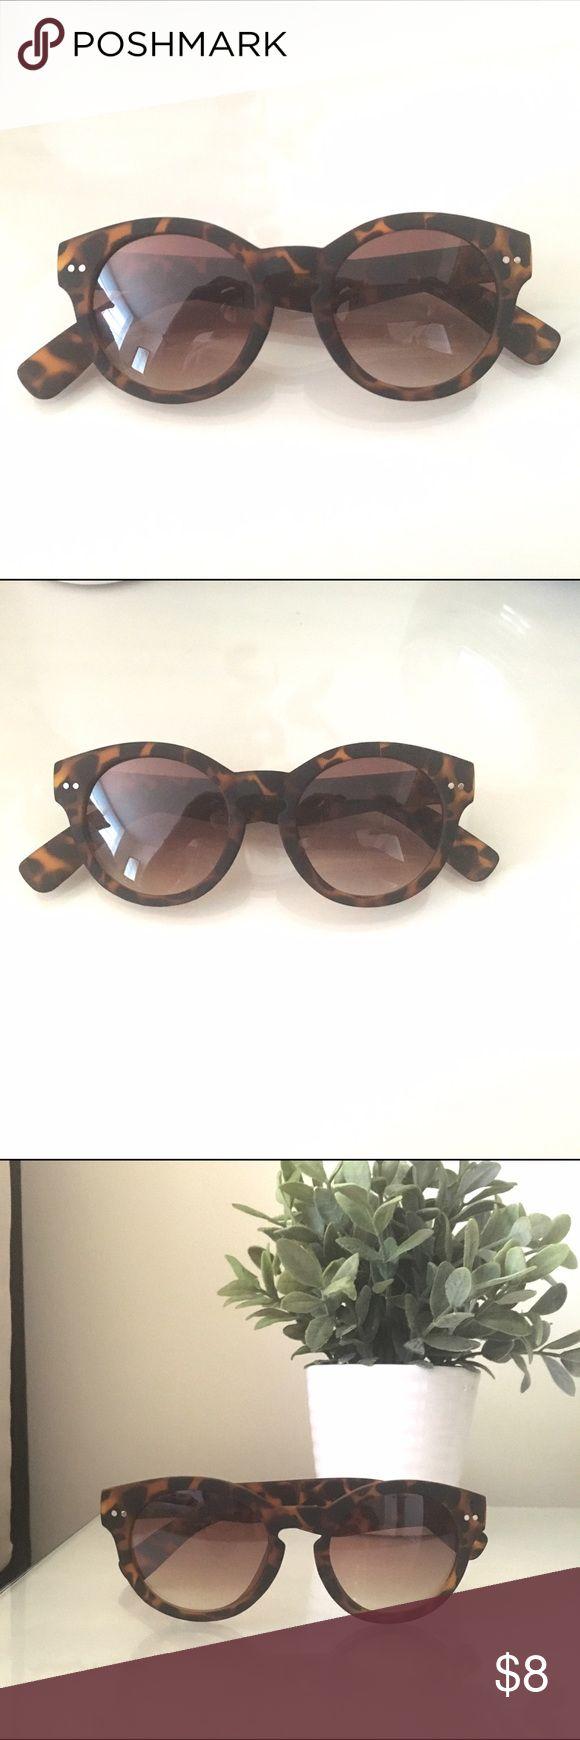 Women's sunglasses! Tortoise shell sunglasses with a soft matte finish. Accessories Sunglasses